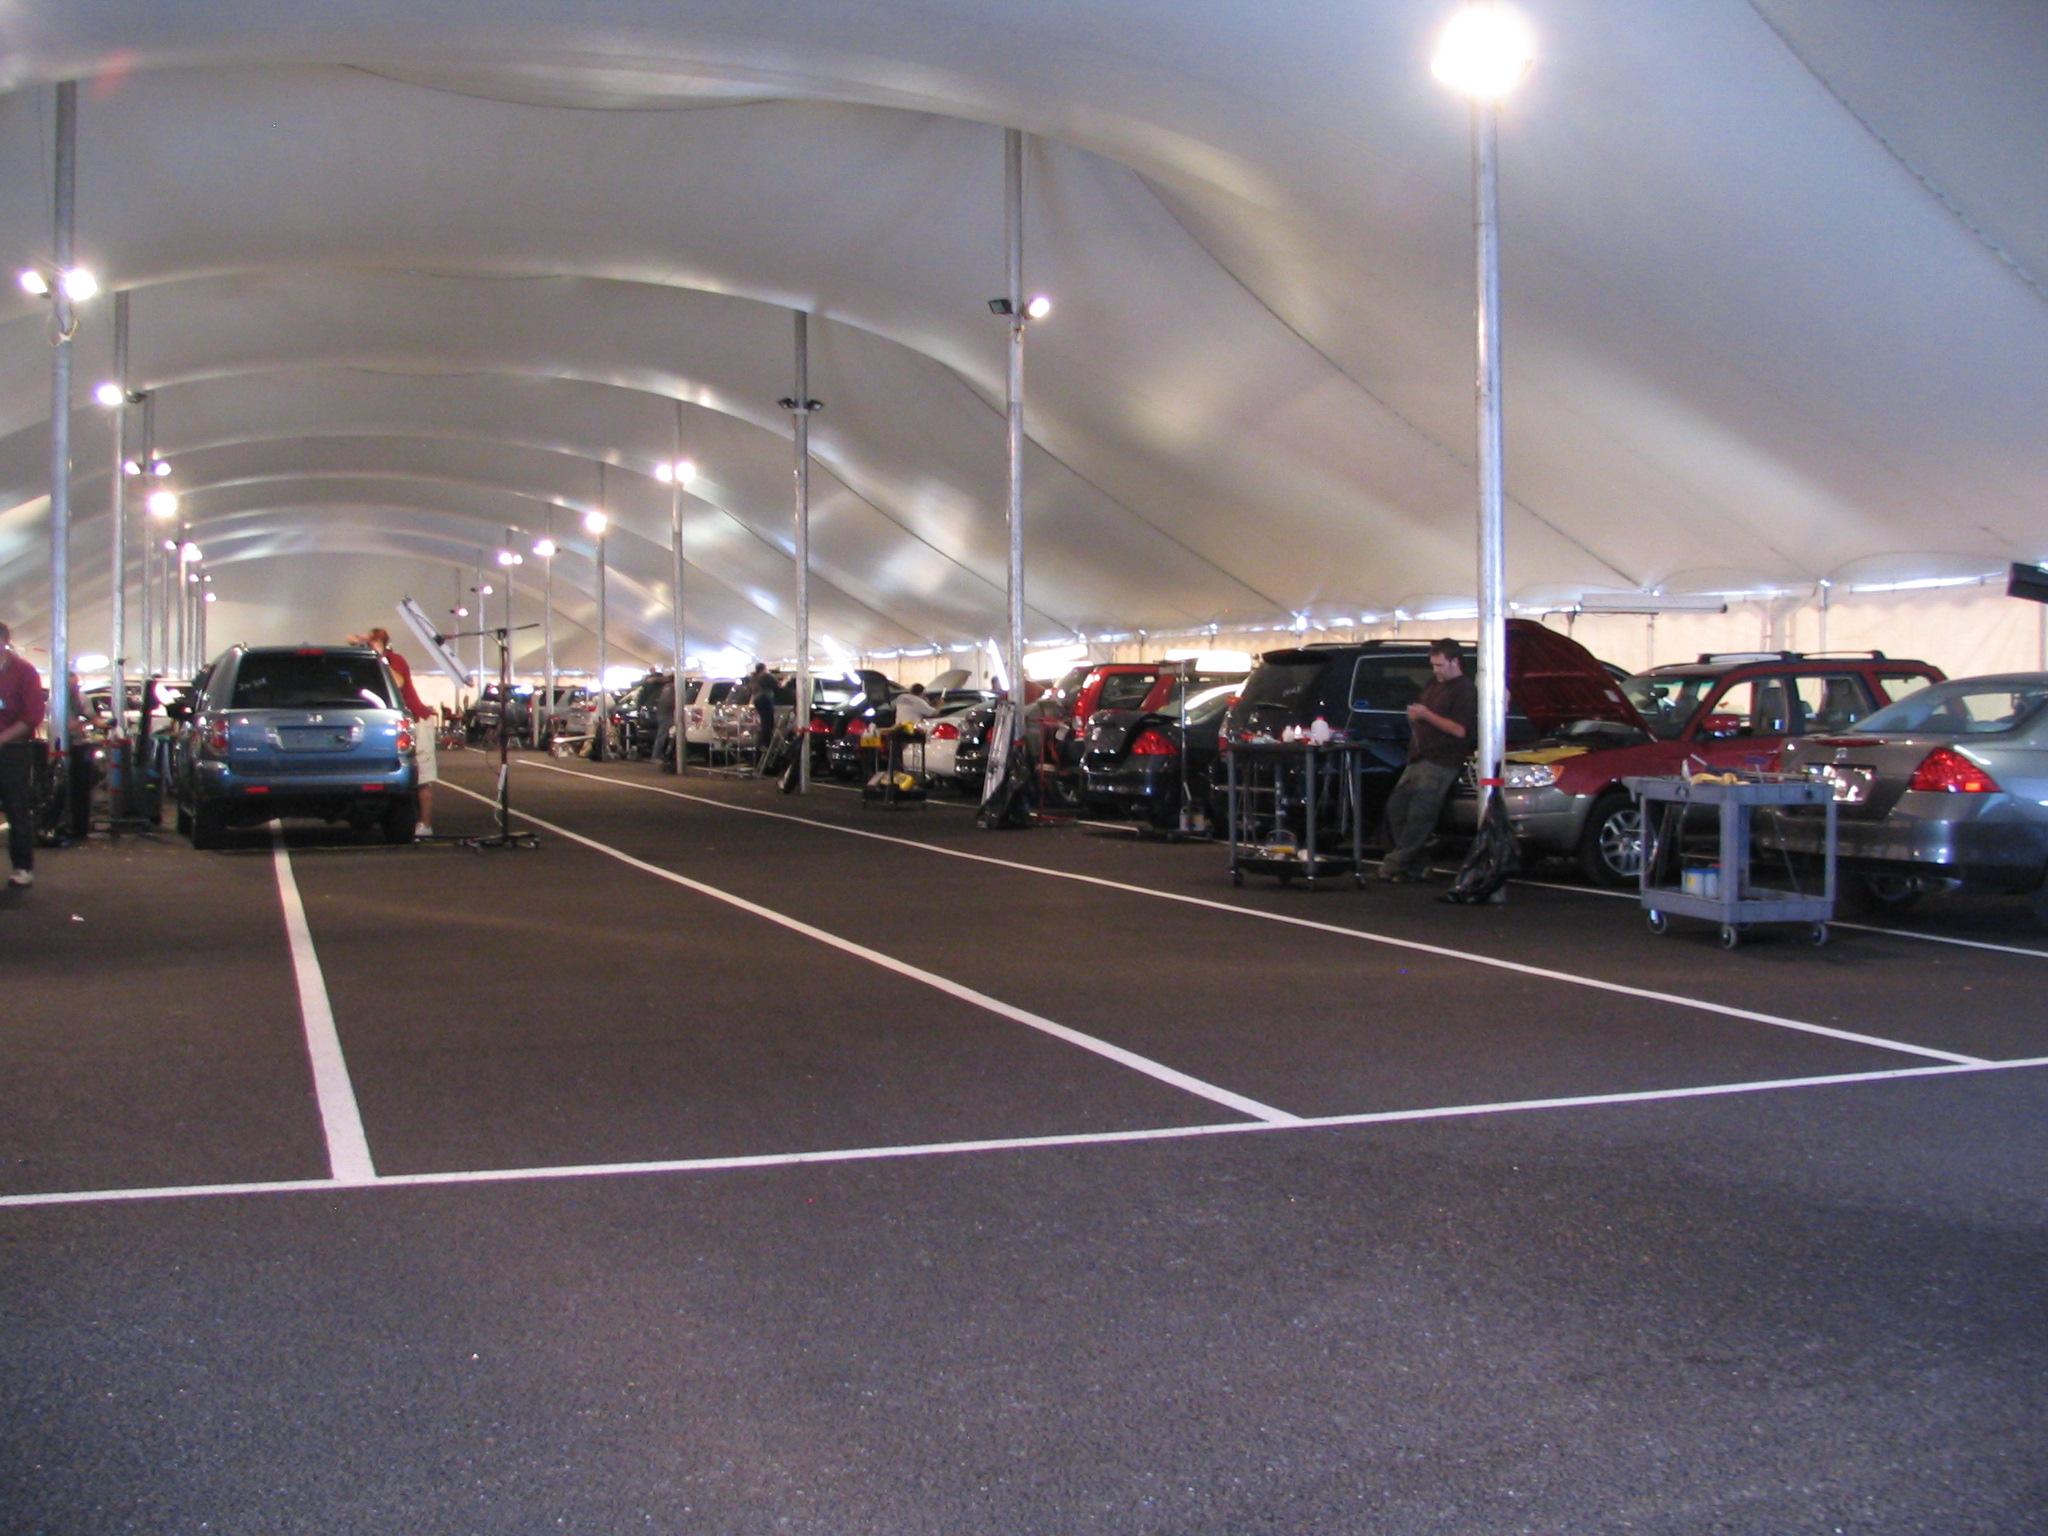 Interior of a Temporary Auto Body Shop Tent